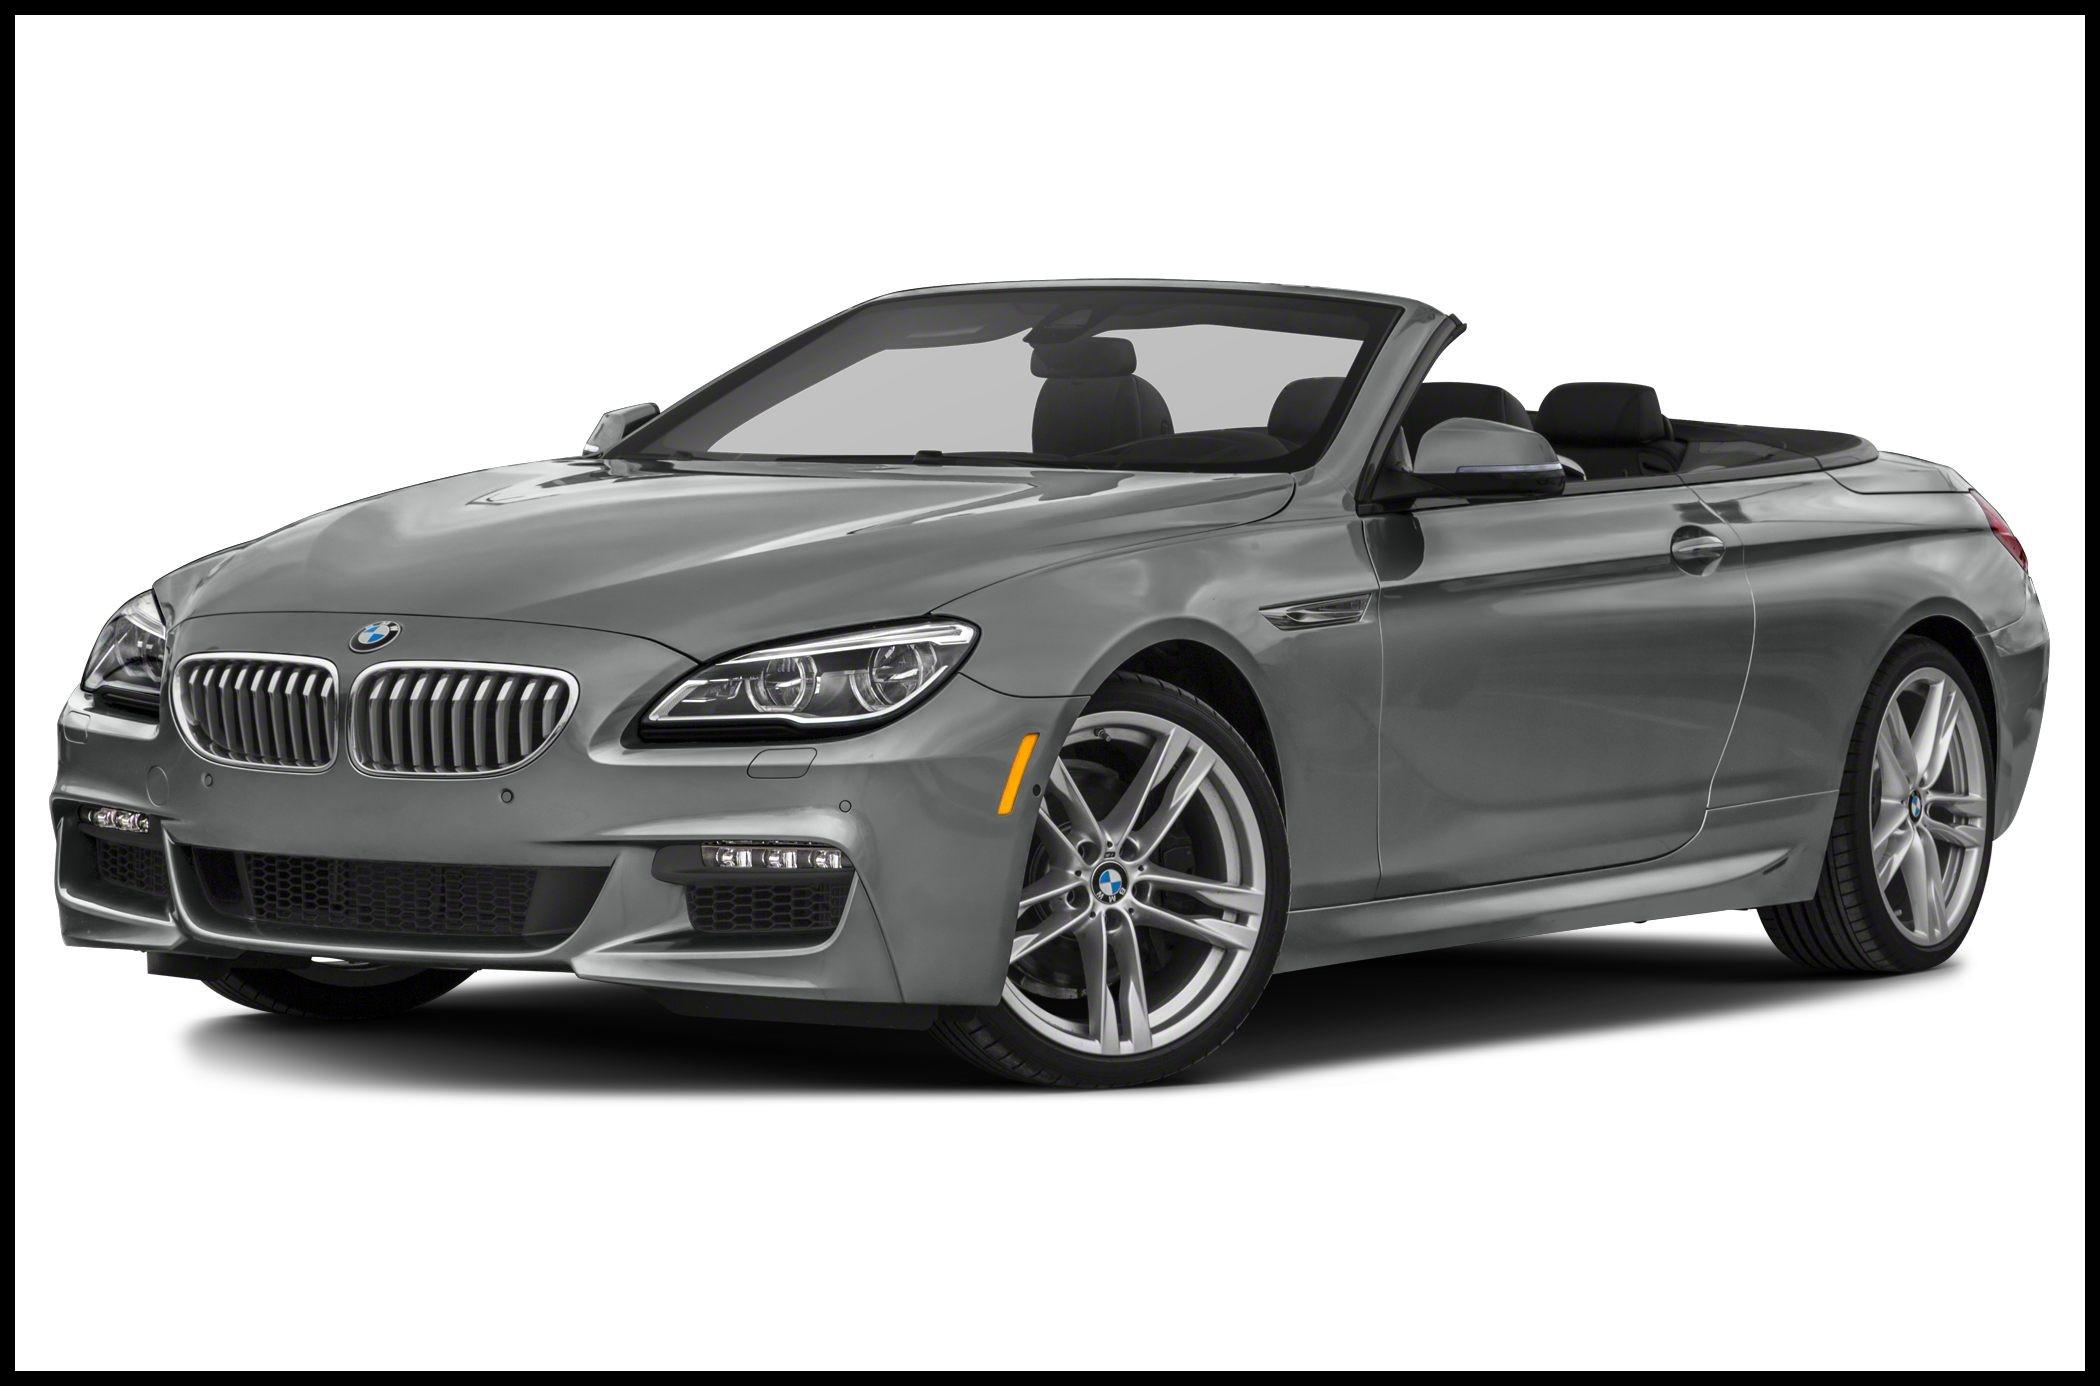 2018 Bmw 650i Convertible Price Unique 2018 Bmw 650